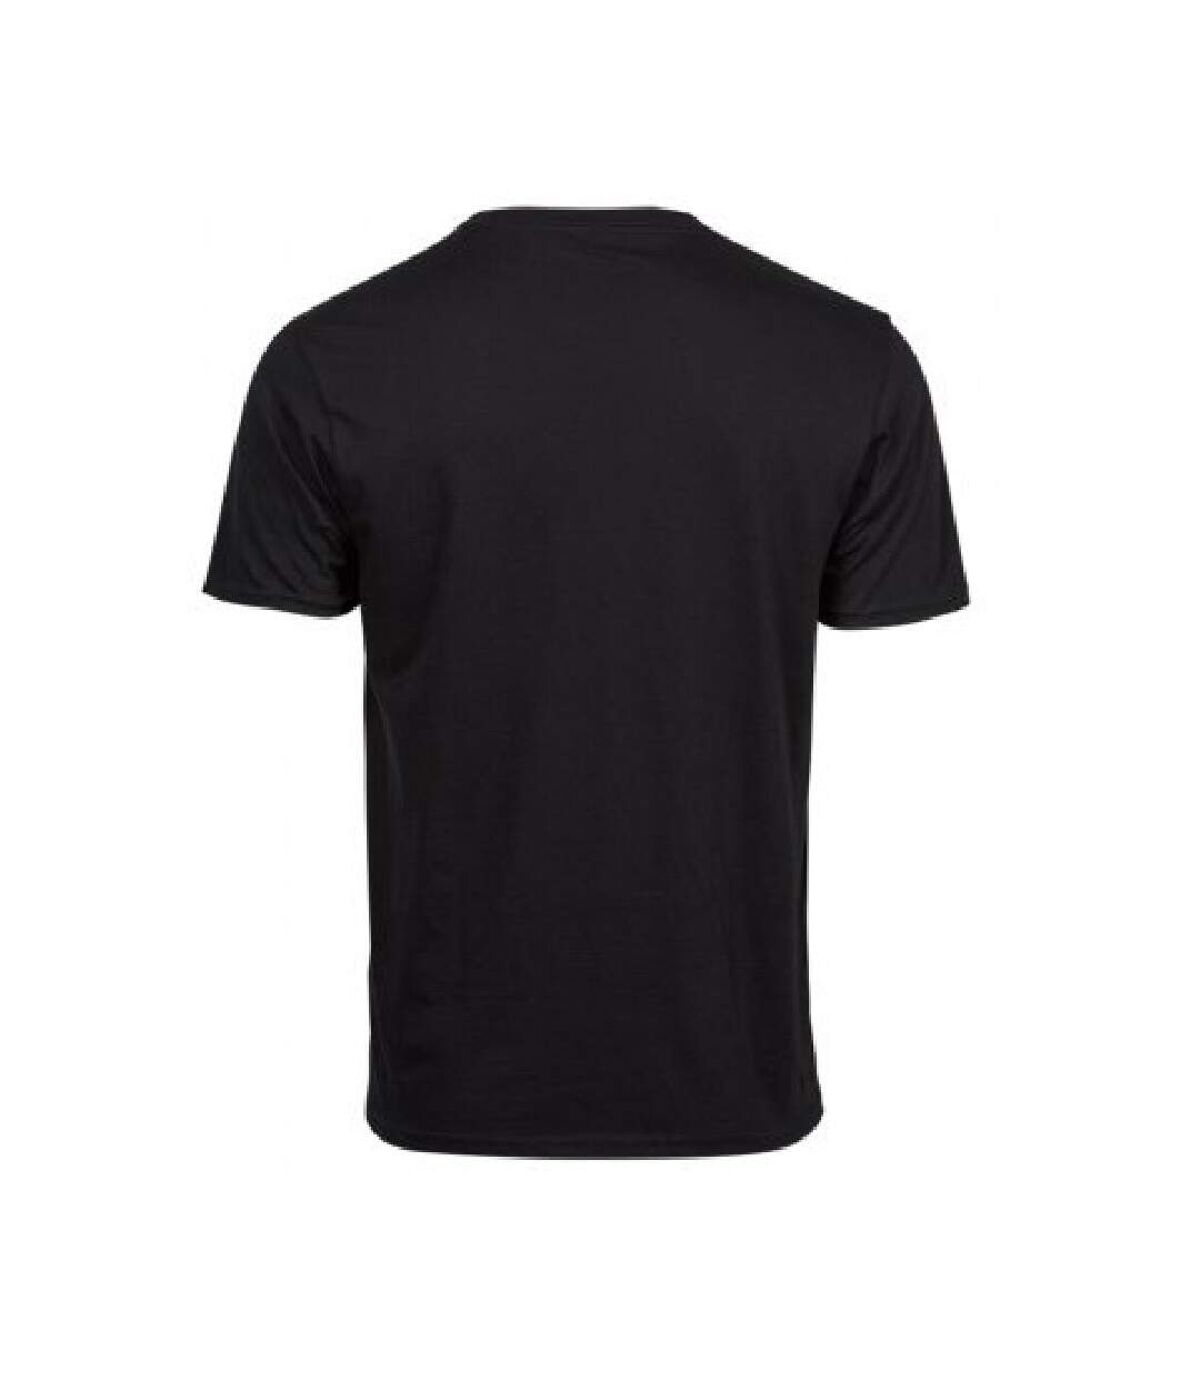 Tee Jays Mens Power T-Shirt (Black) - UTPC4092